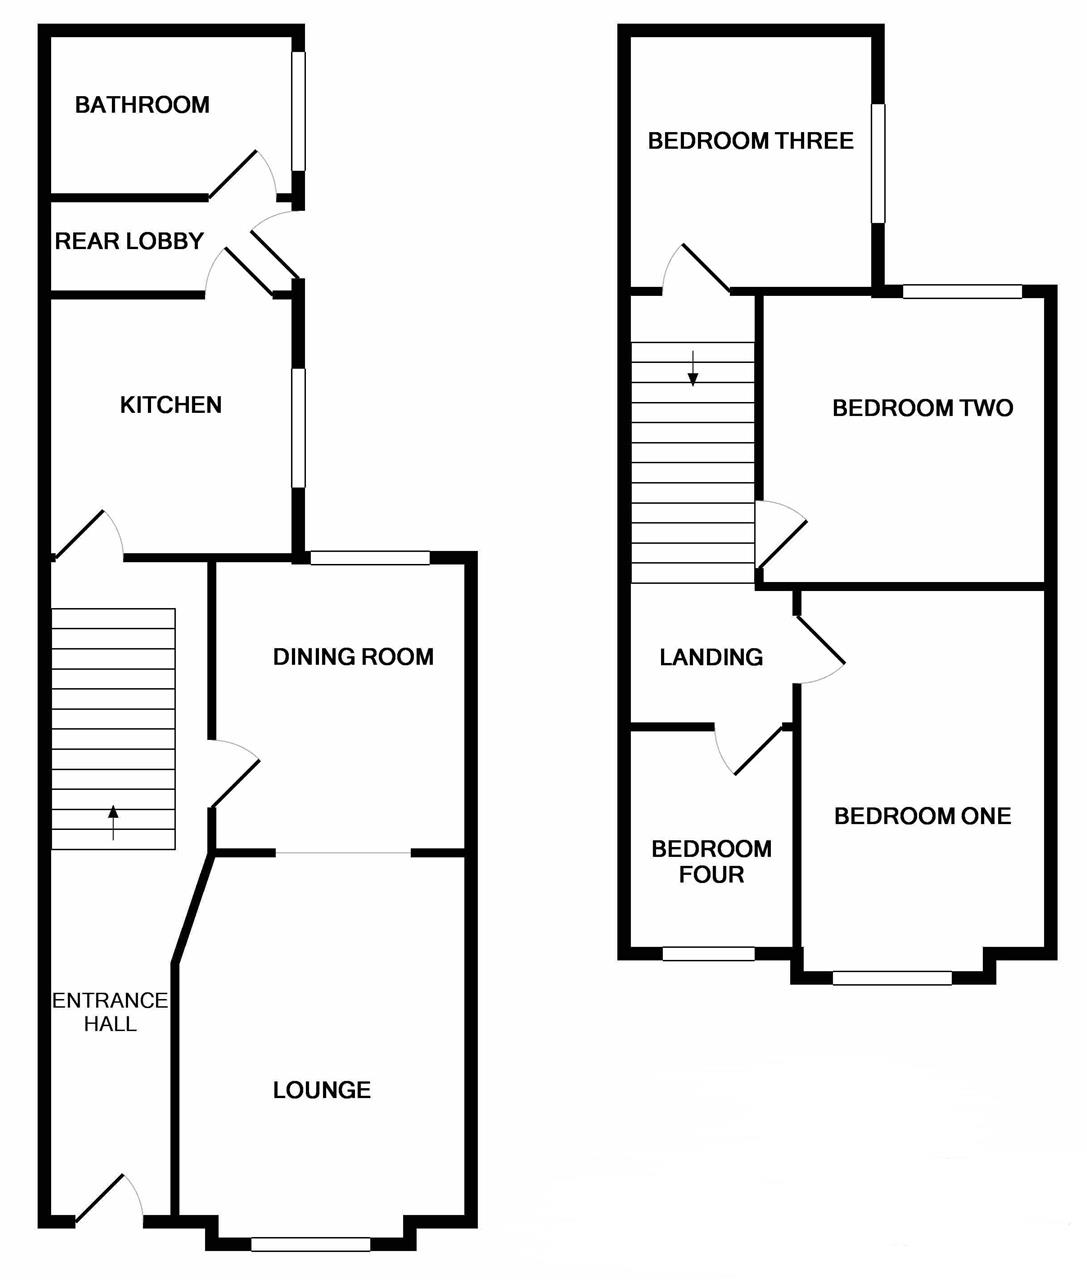 garland road parkeston harwich co12 4 bedroom property for sale